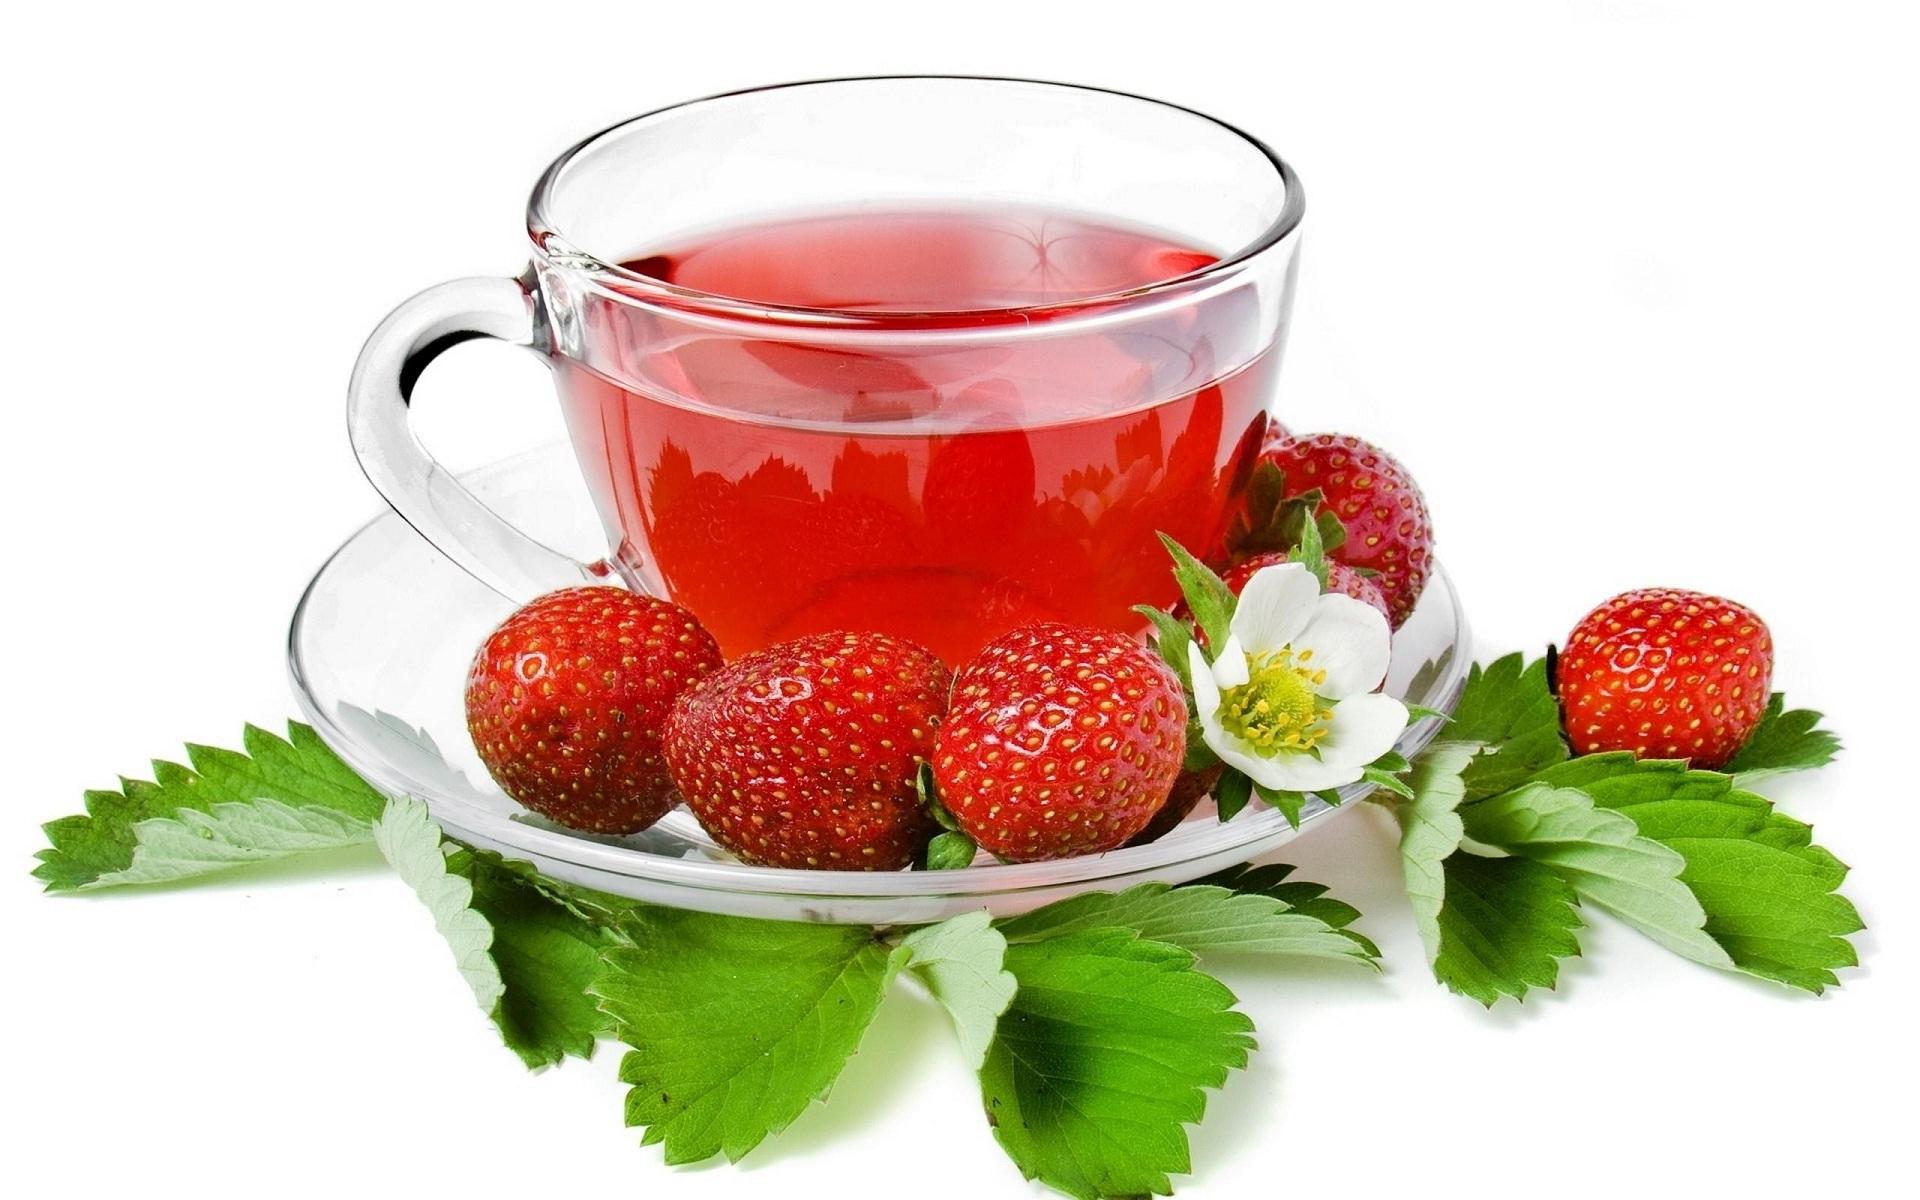 Strawberry juice fruits HD wallpapers HD Wallpapers Rocks 1920x1200